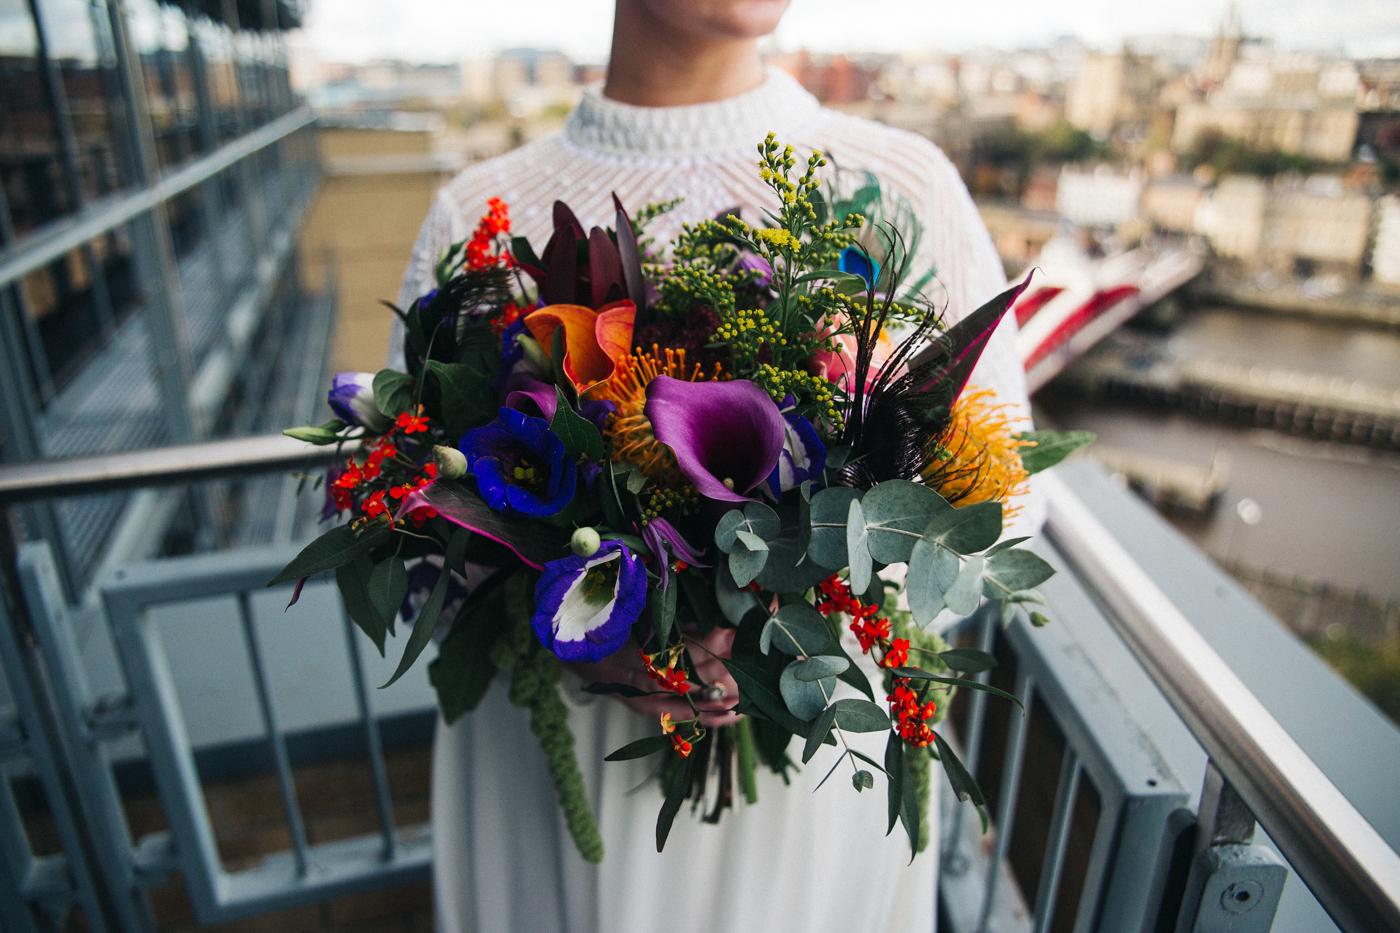 teesside-newcastle-gateshead-wedding-photography-photographer-creative-0020.jpg